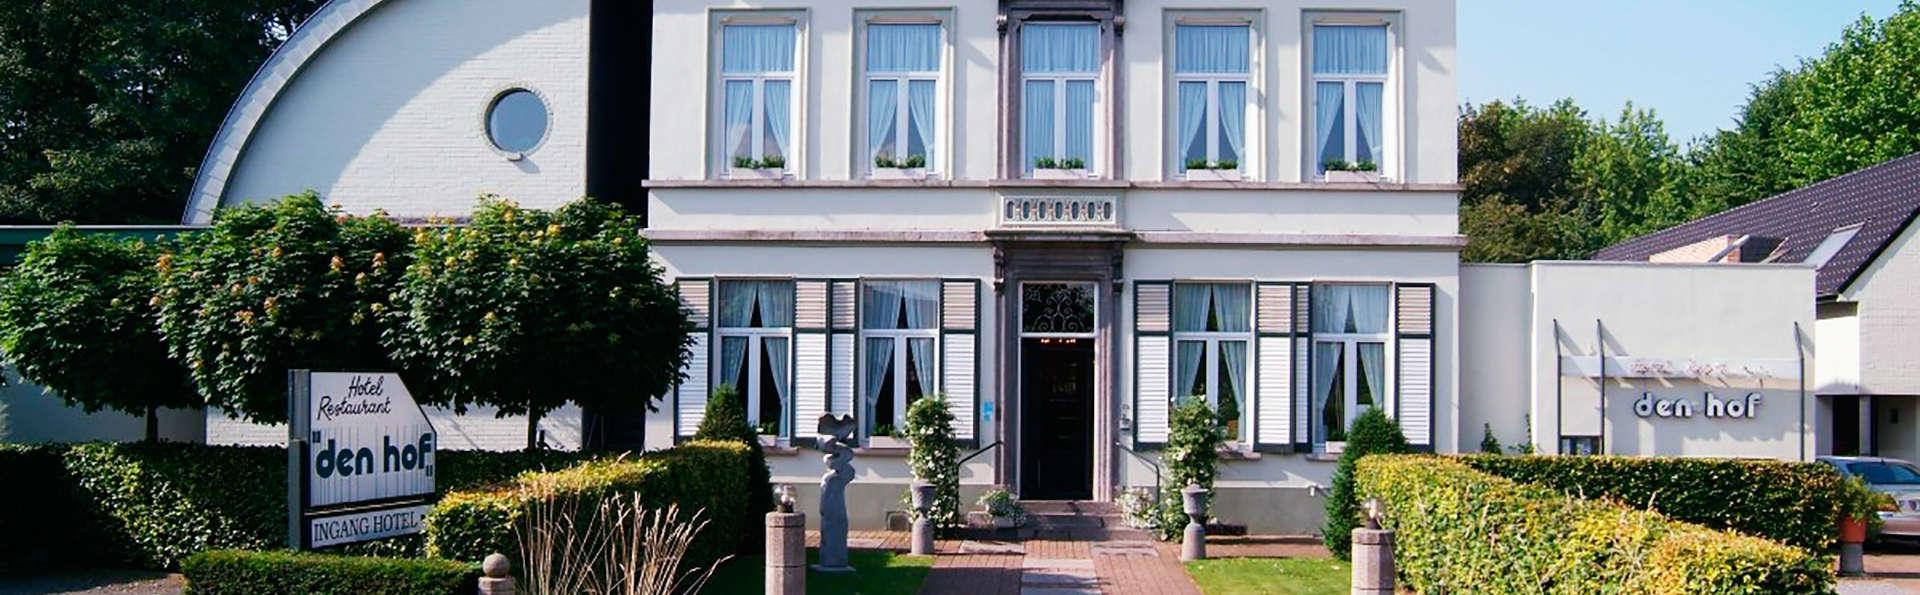 Hotel-Restaurant Den Hof - edit_VOORGEVEL.jpg